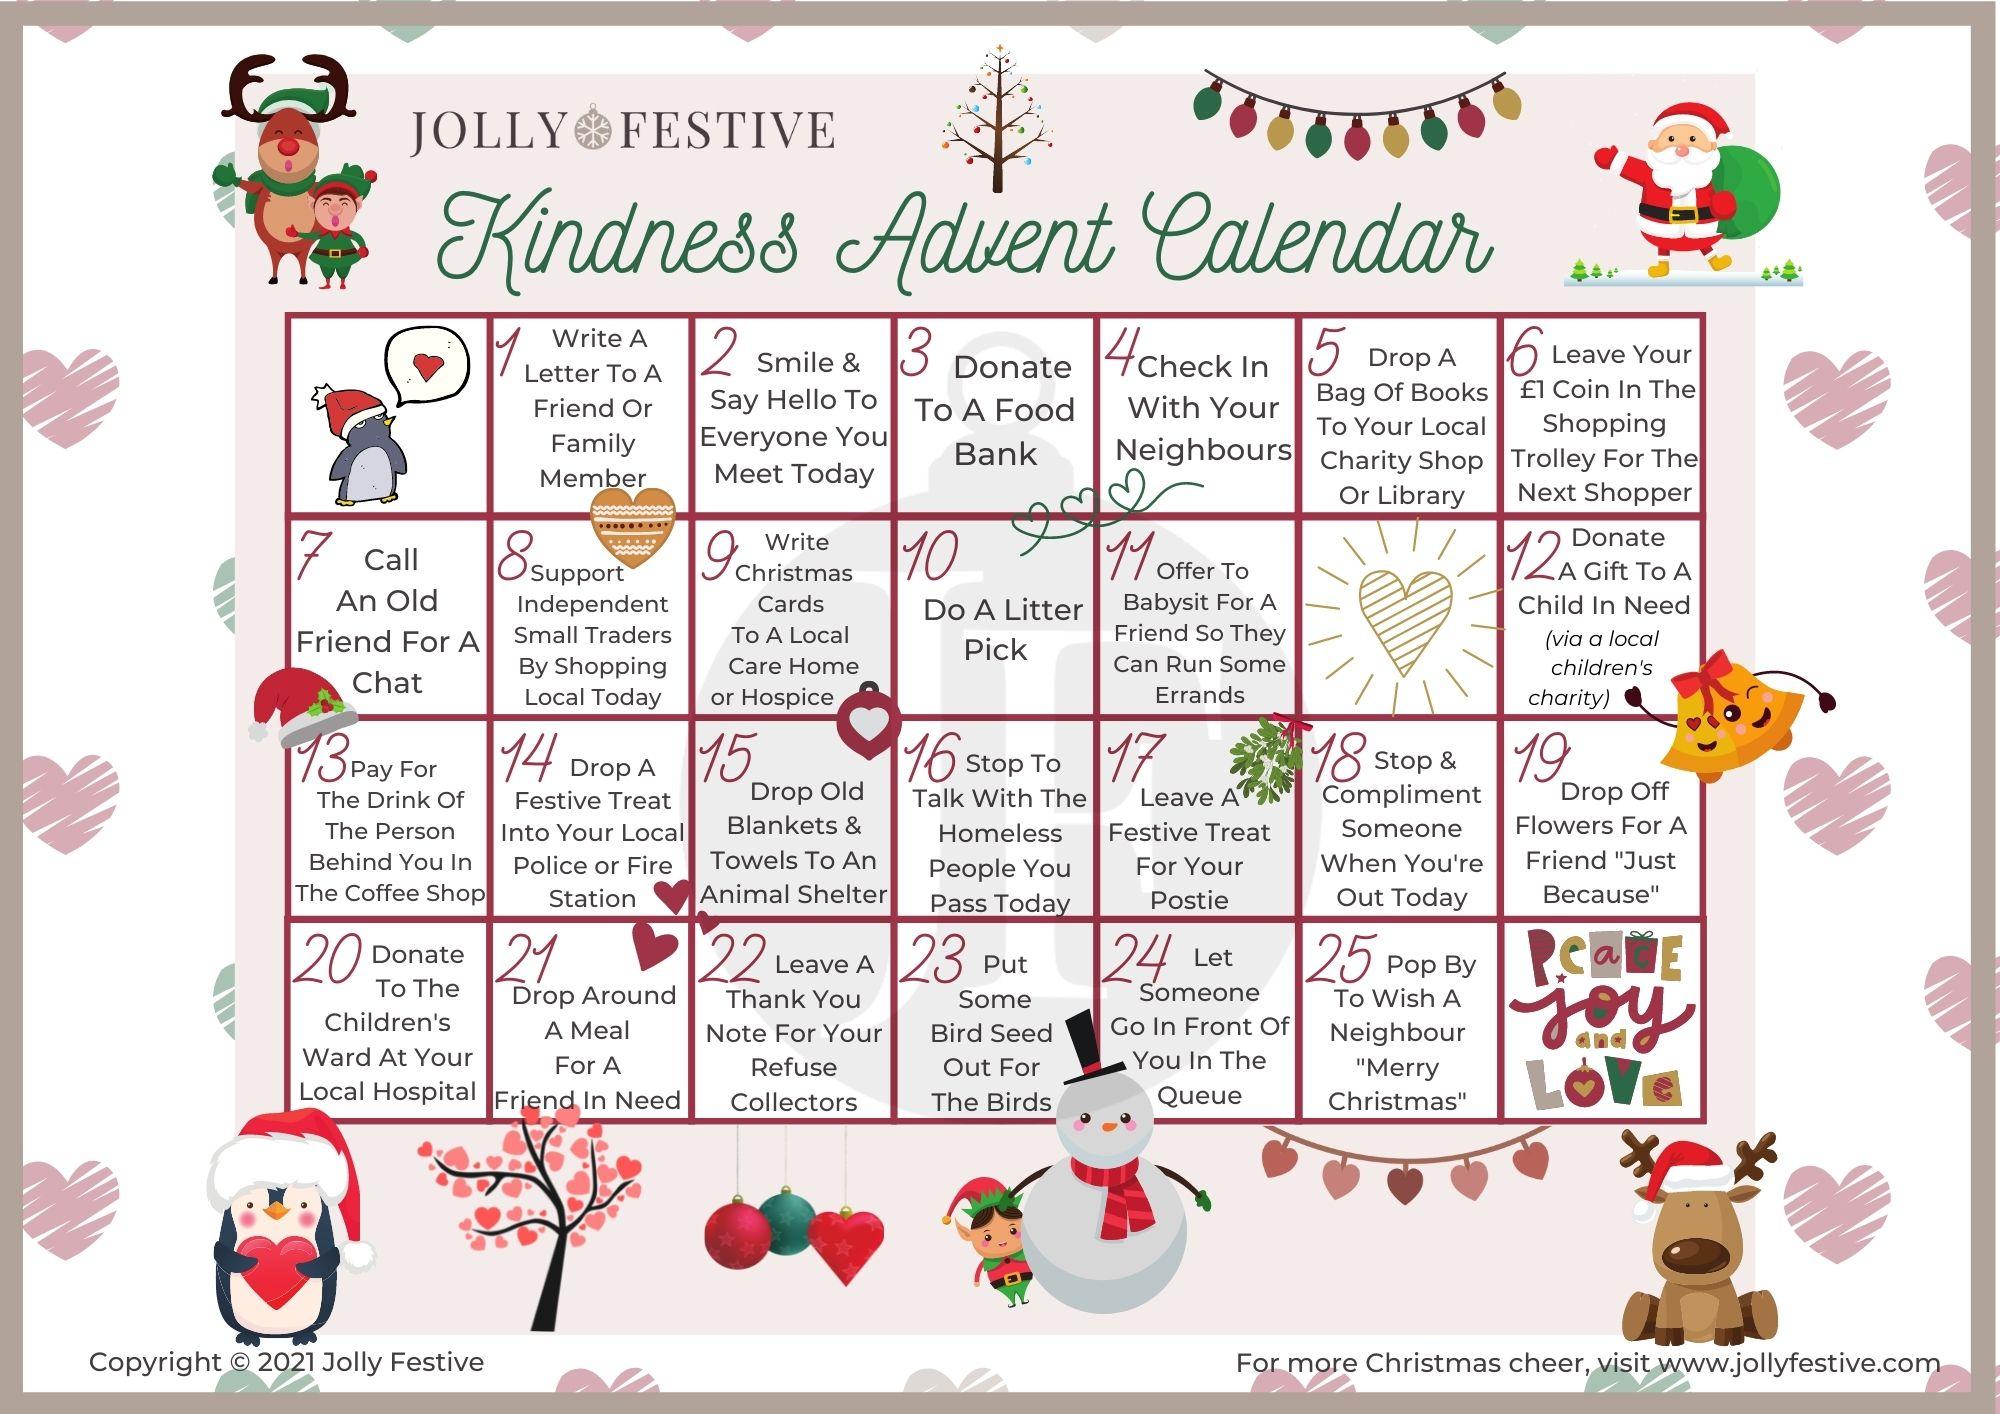 25 Days of Activities Kindness Advent Calendar